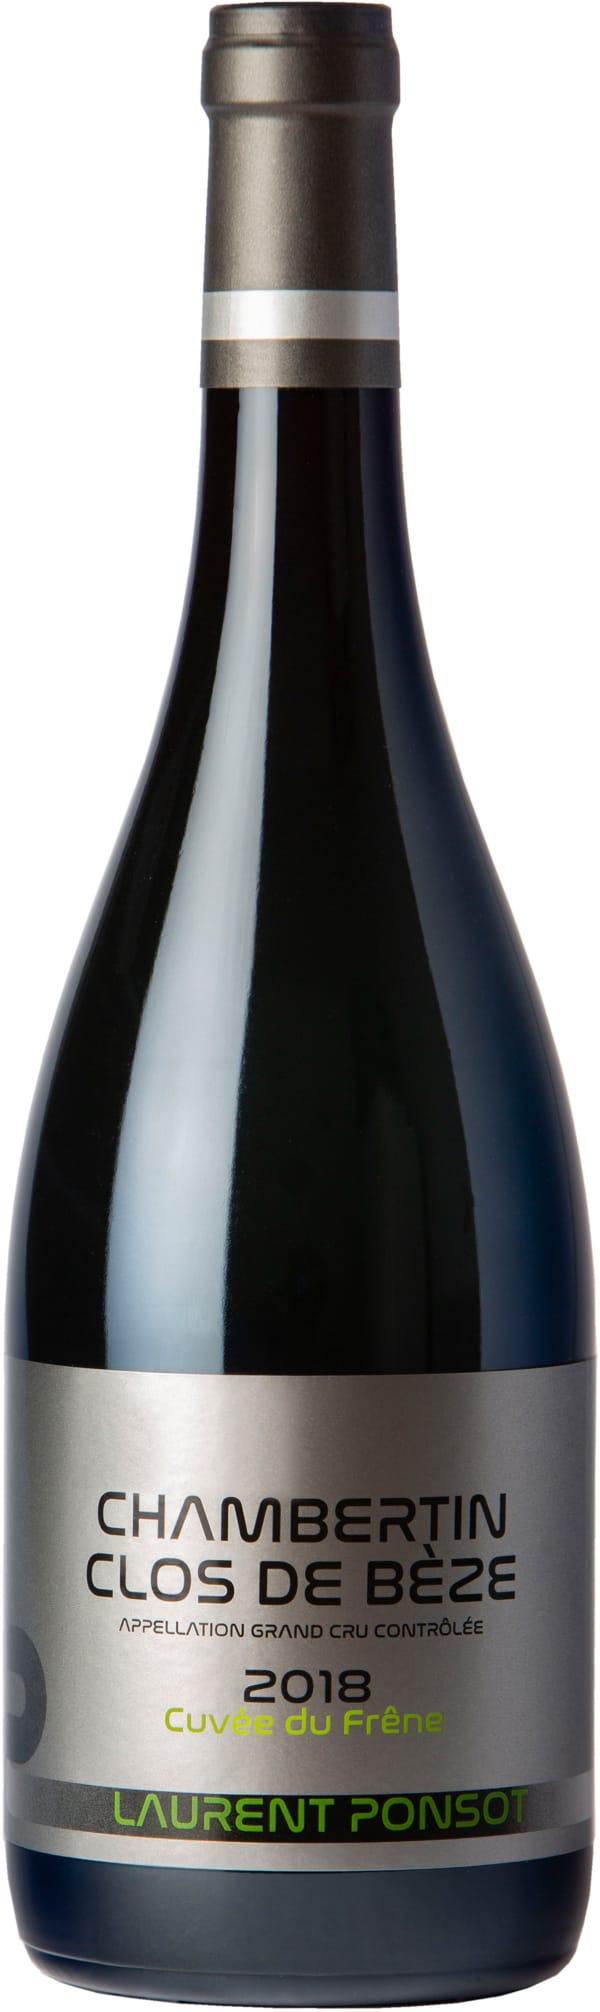 Laurent Ponsot Chambertin-Clos de Bèze Grand Cru Cuvée du Frêne 2018